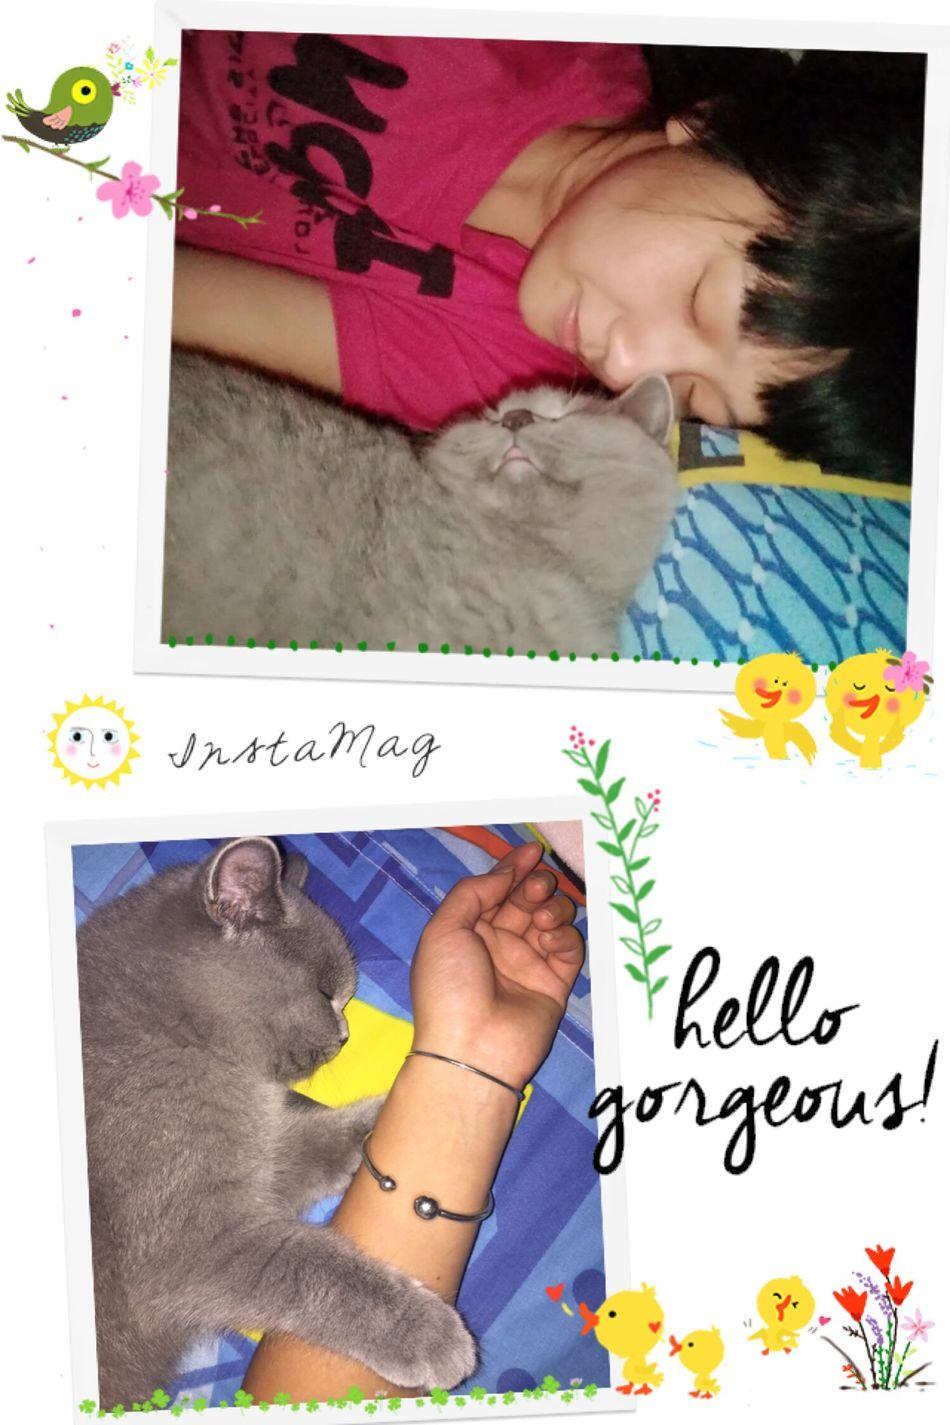 Cute Cats Cute♡ Cute Pets Cute Catlover Catlovers Catportrait 猫咪 蓝猫 Bluecat Blue Cat Cat Cats Cat♡ Cat Lovers Cats Of EyeEm Cats 🐱 Pets Today's Hot Look